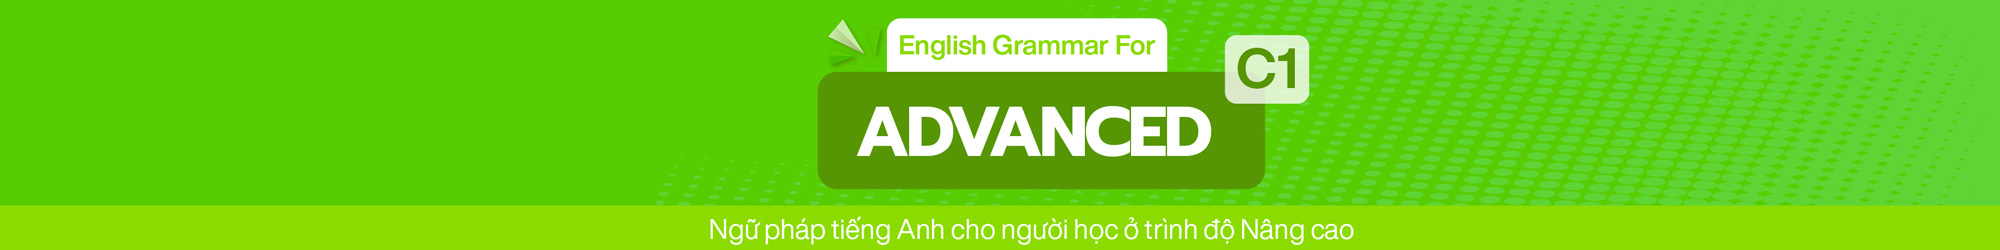 English Grammar For Advanced (C1) banner